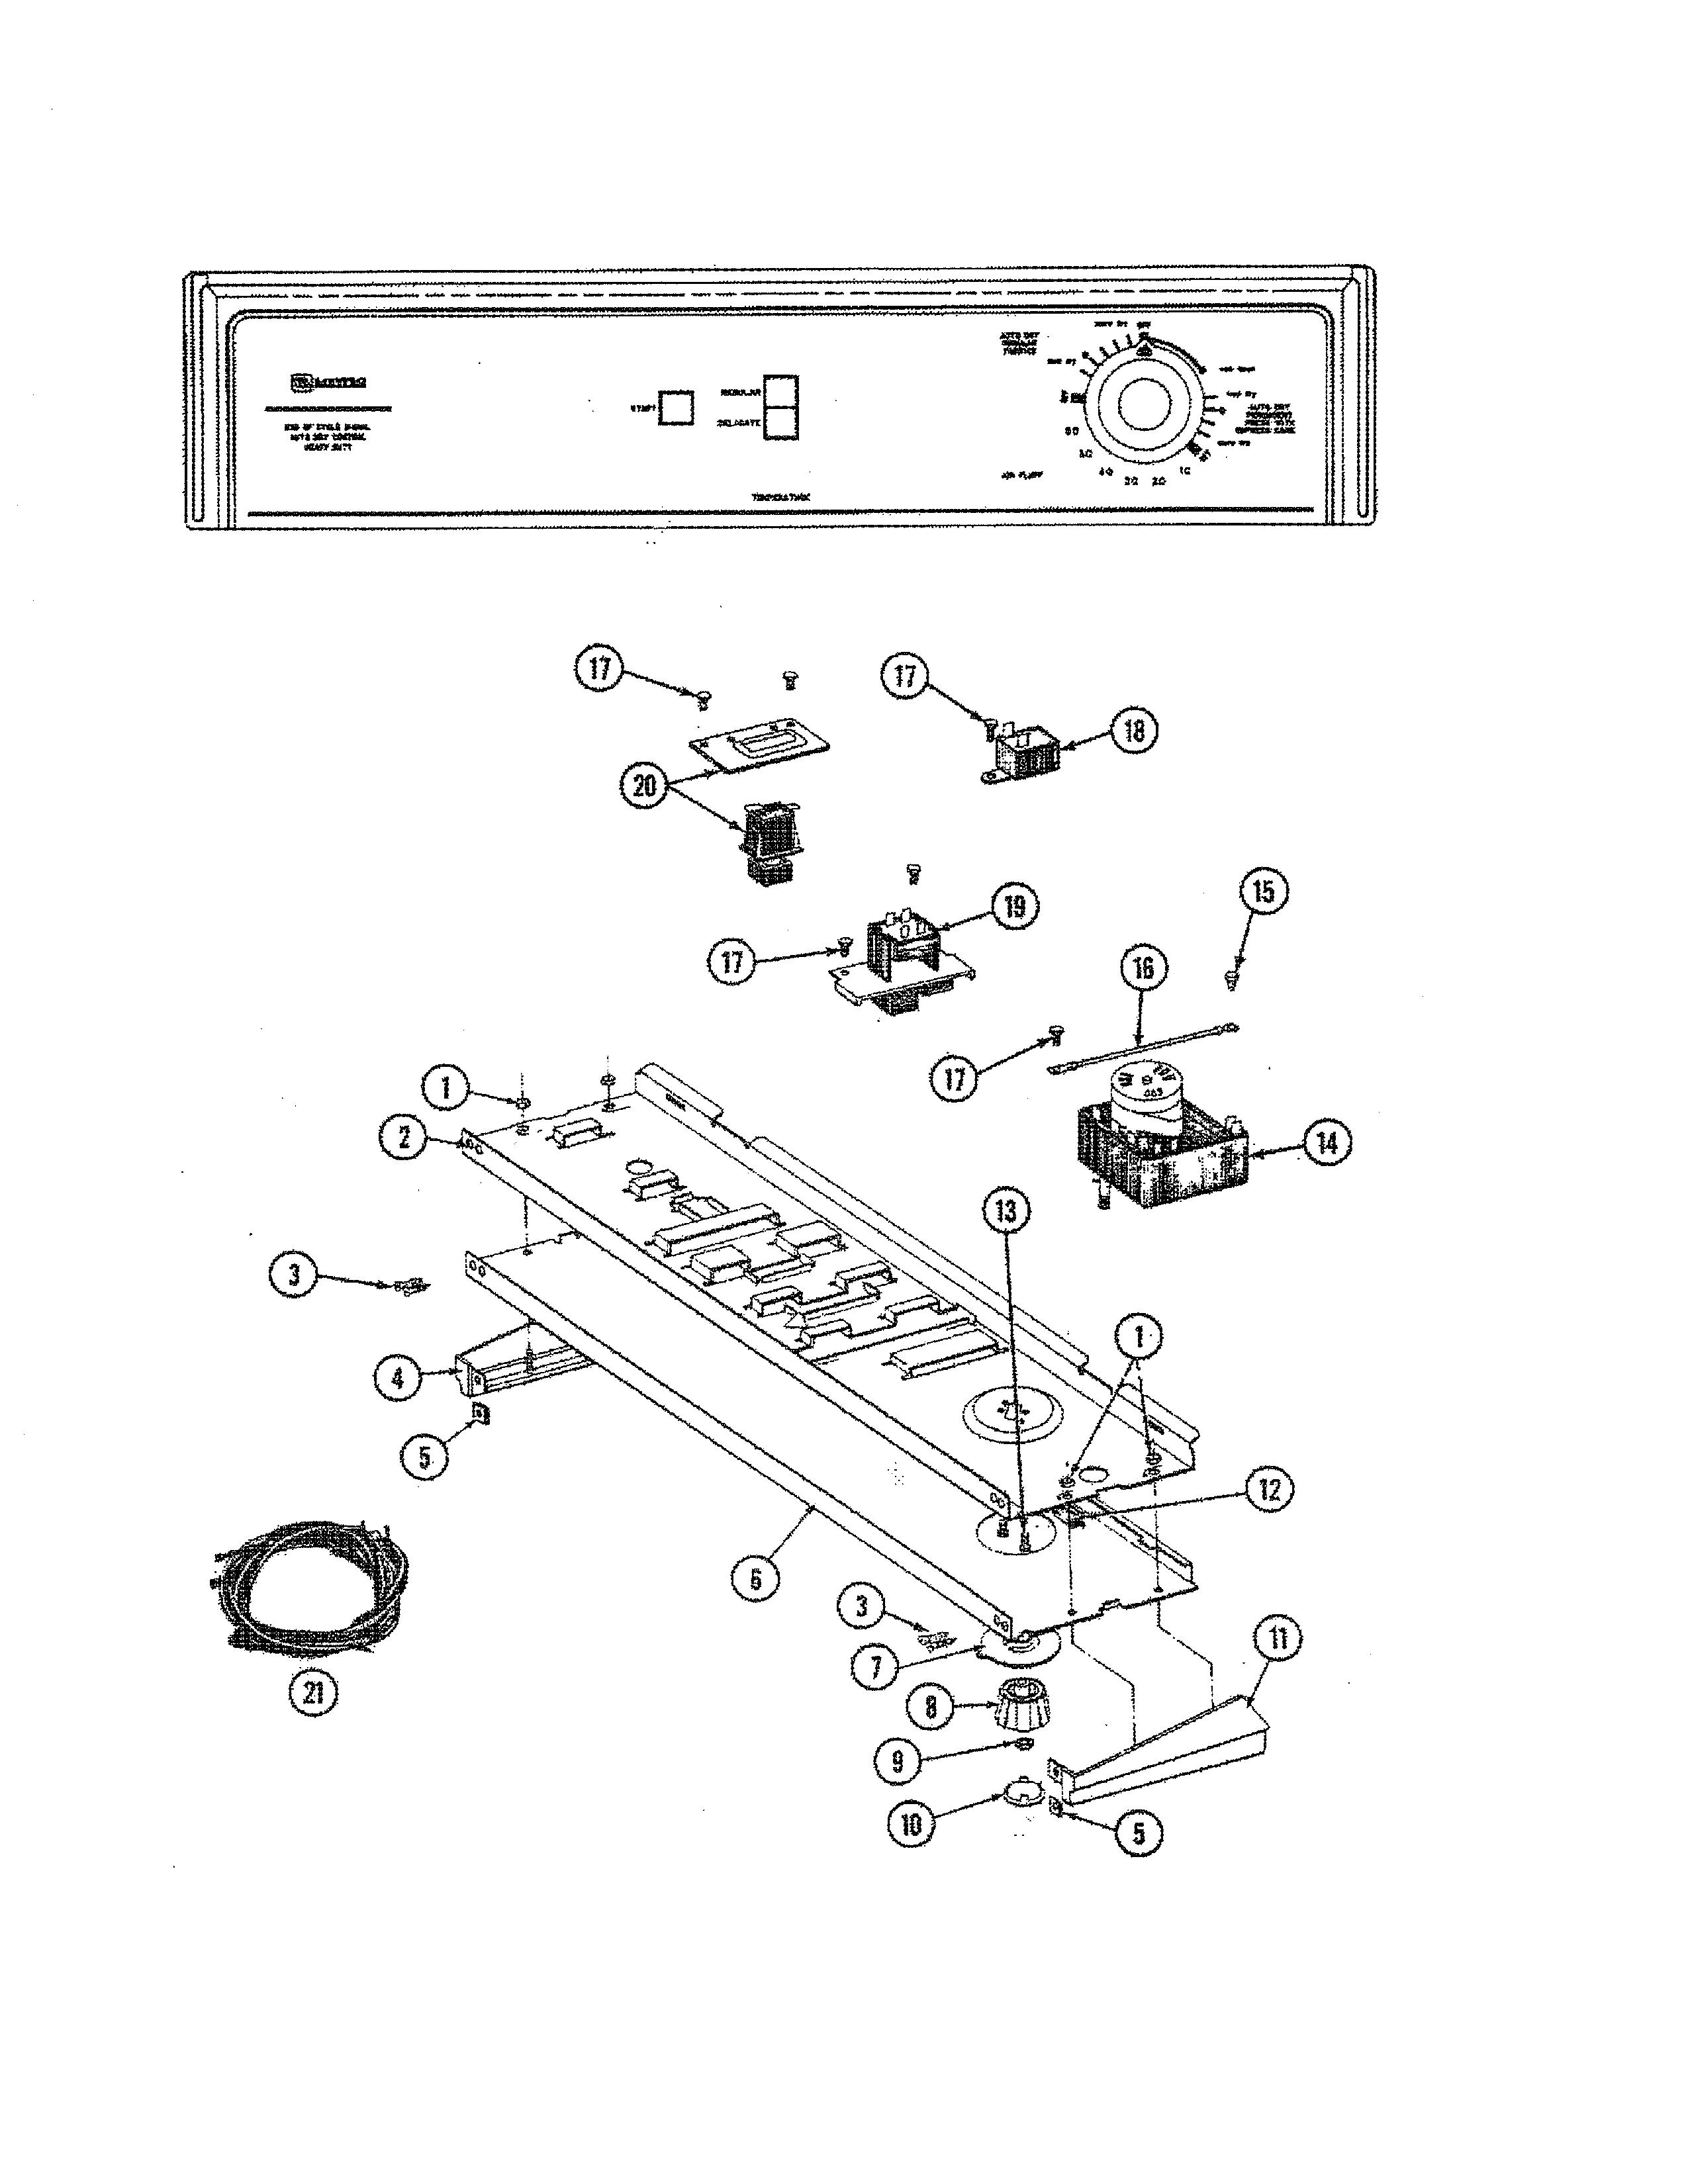 Maytag Ldg7500aaw Wiring Diagram